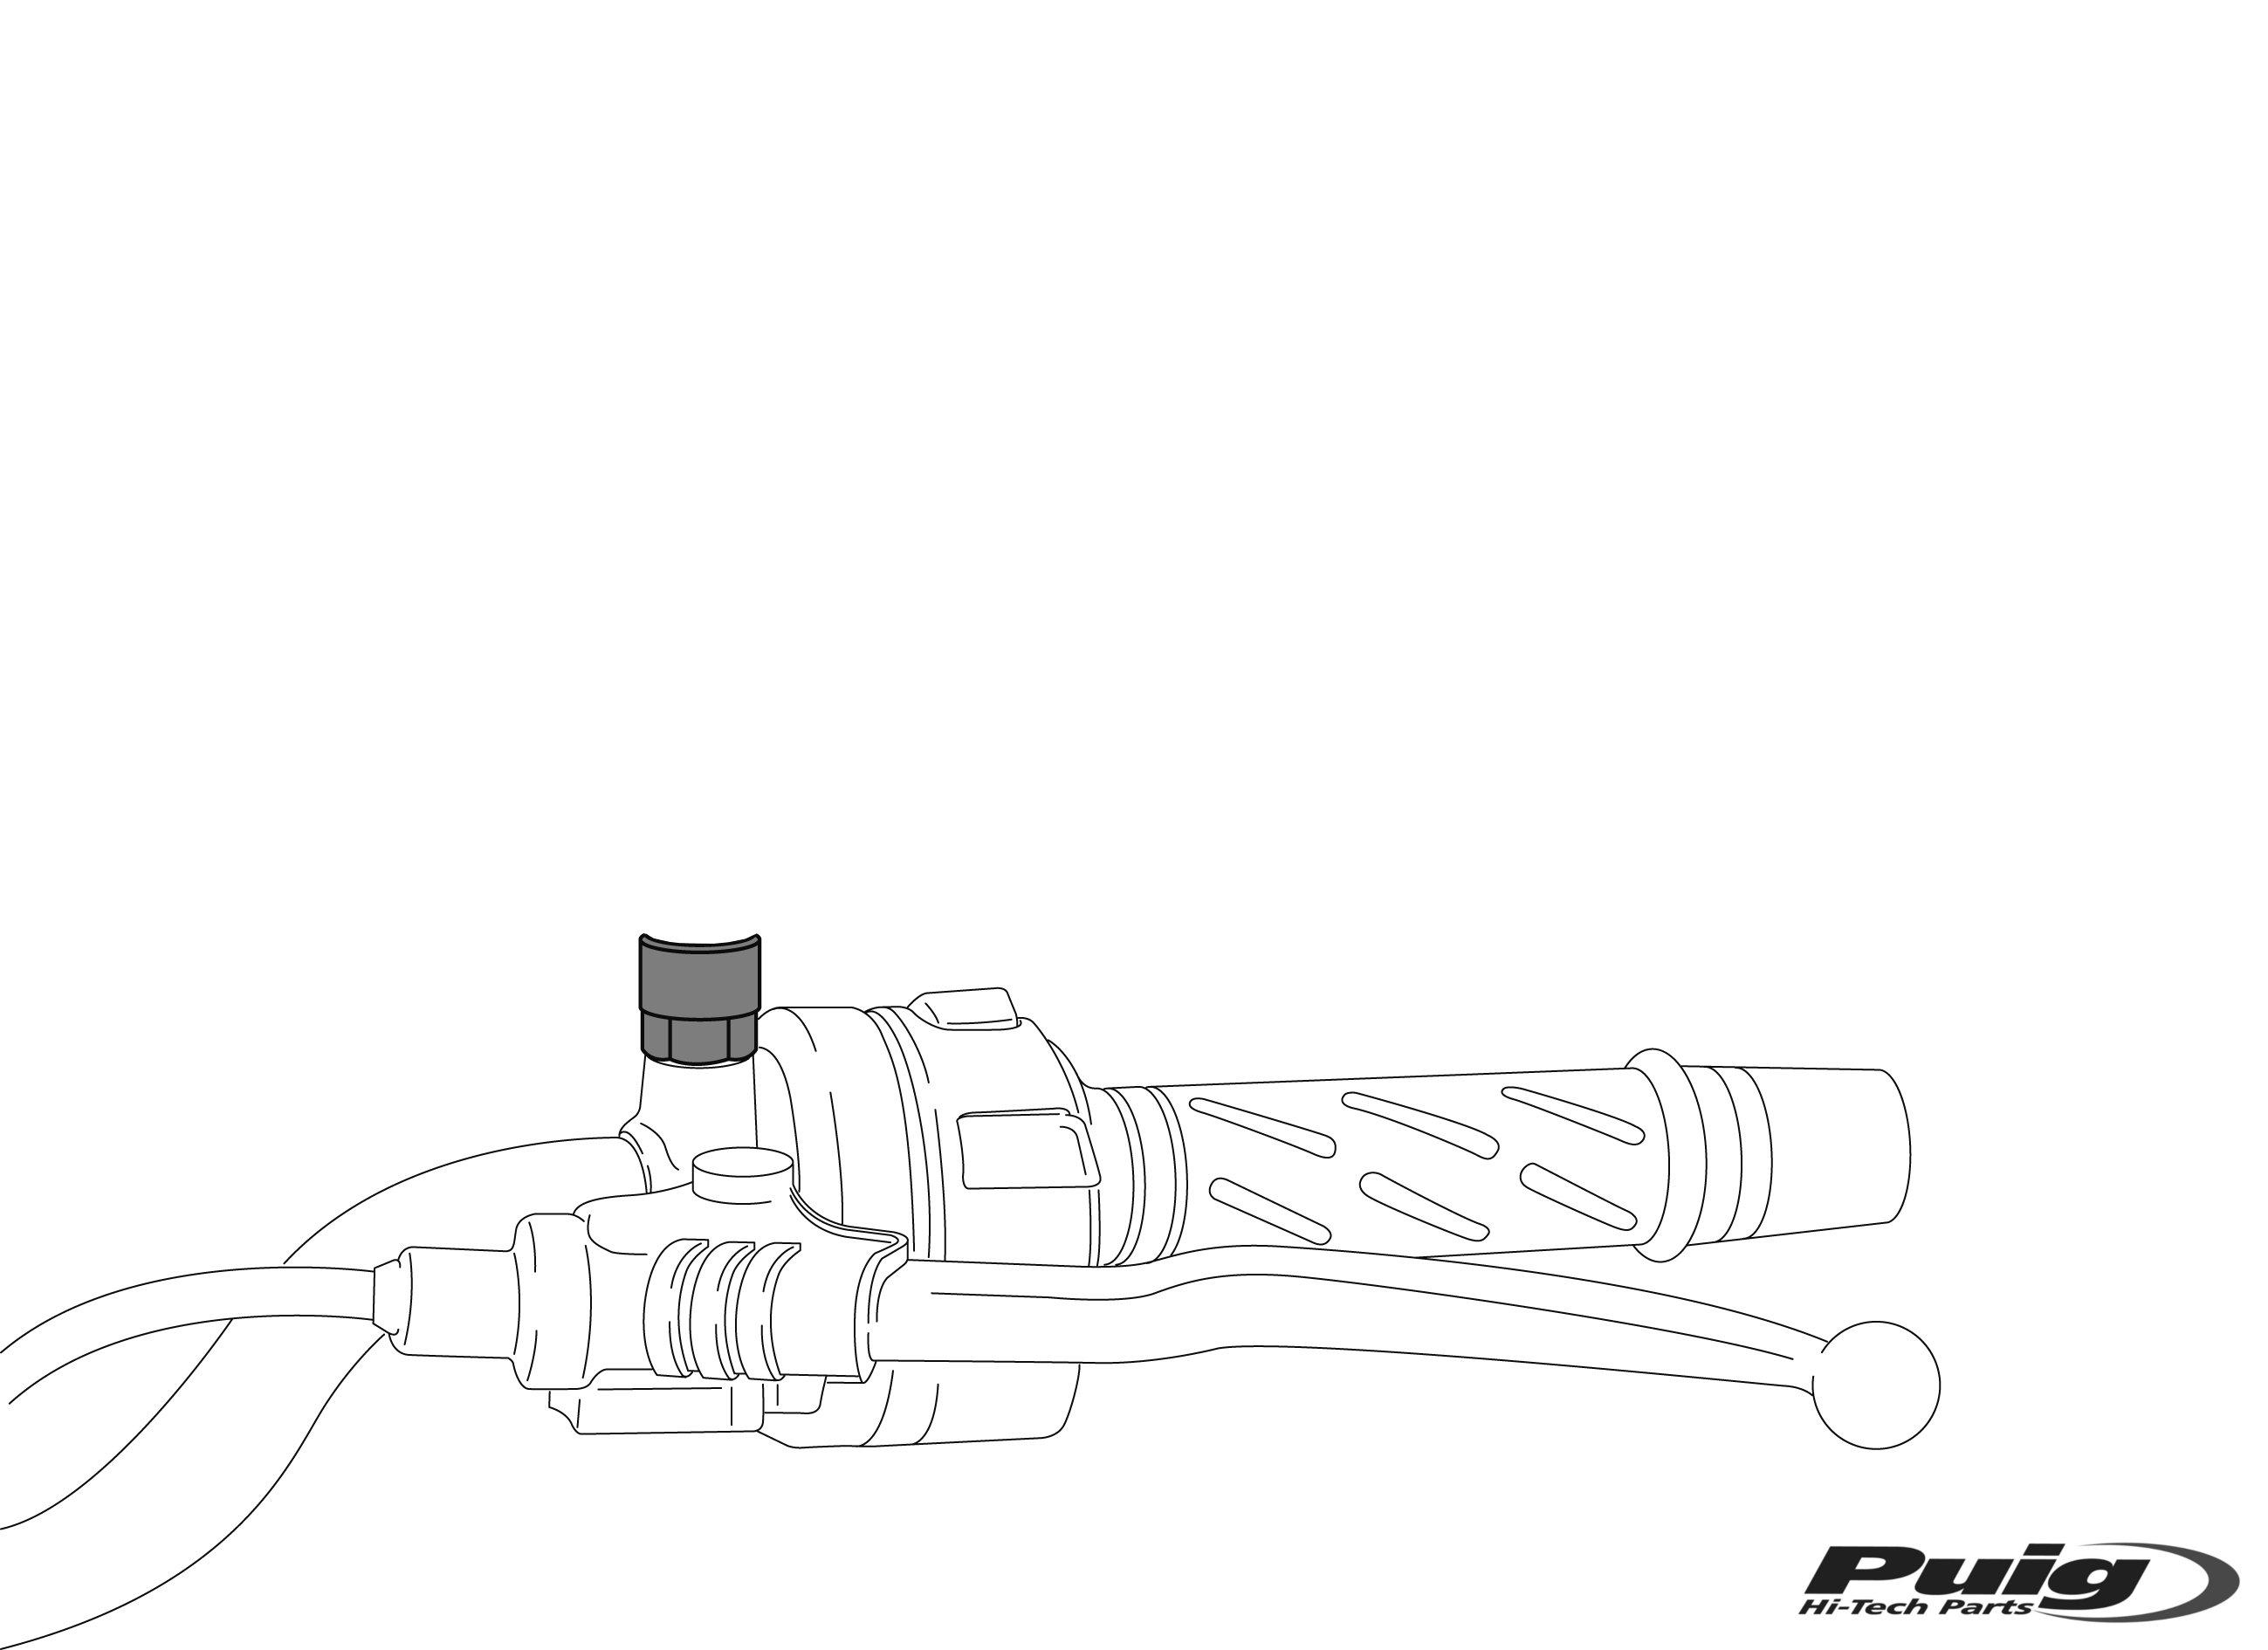 Adaptador para retrovisores Puig 9984N lado izquierdo para BMW (Mirar modelos comaptibles)